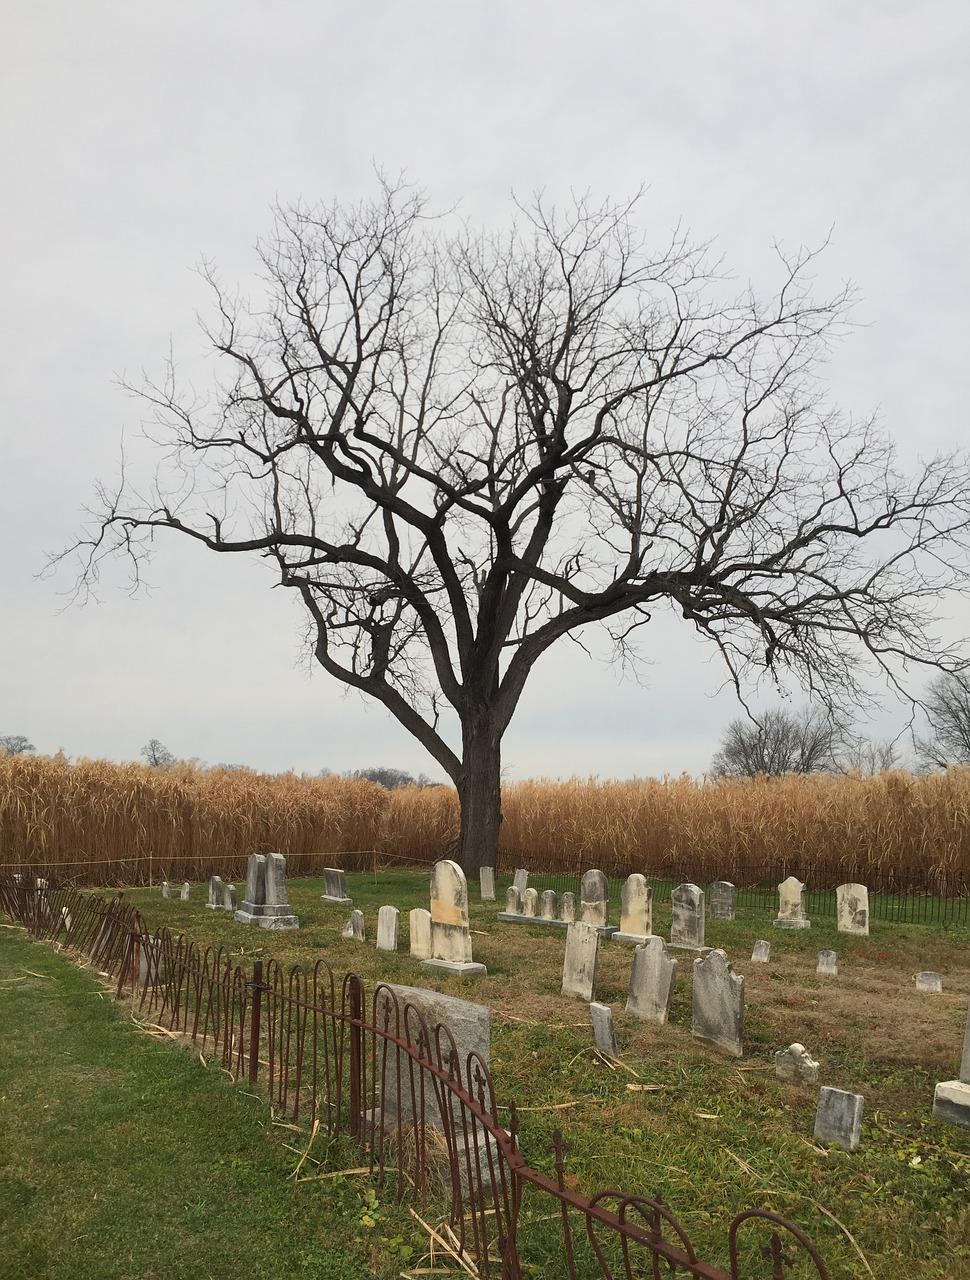 cemetery,tree,october,halloween,graveyard - free photo from needpix